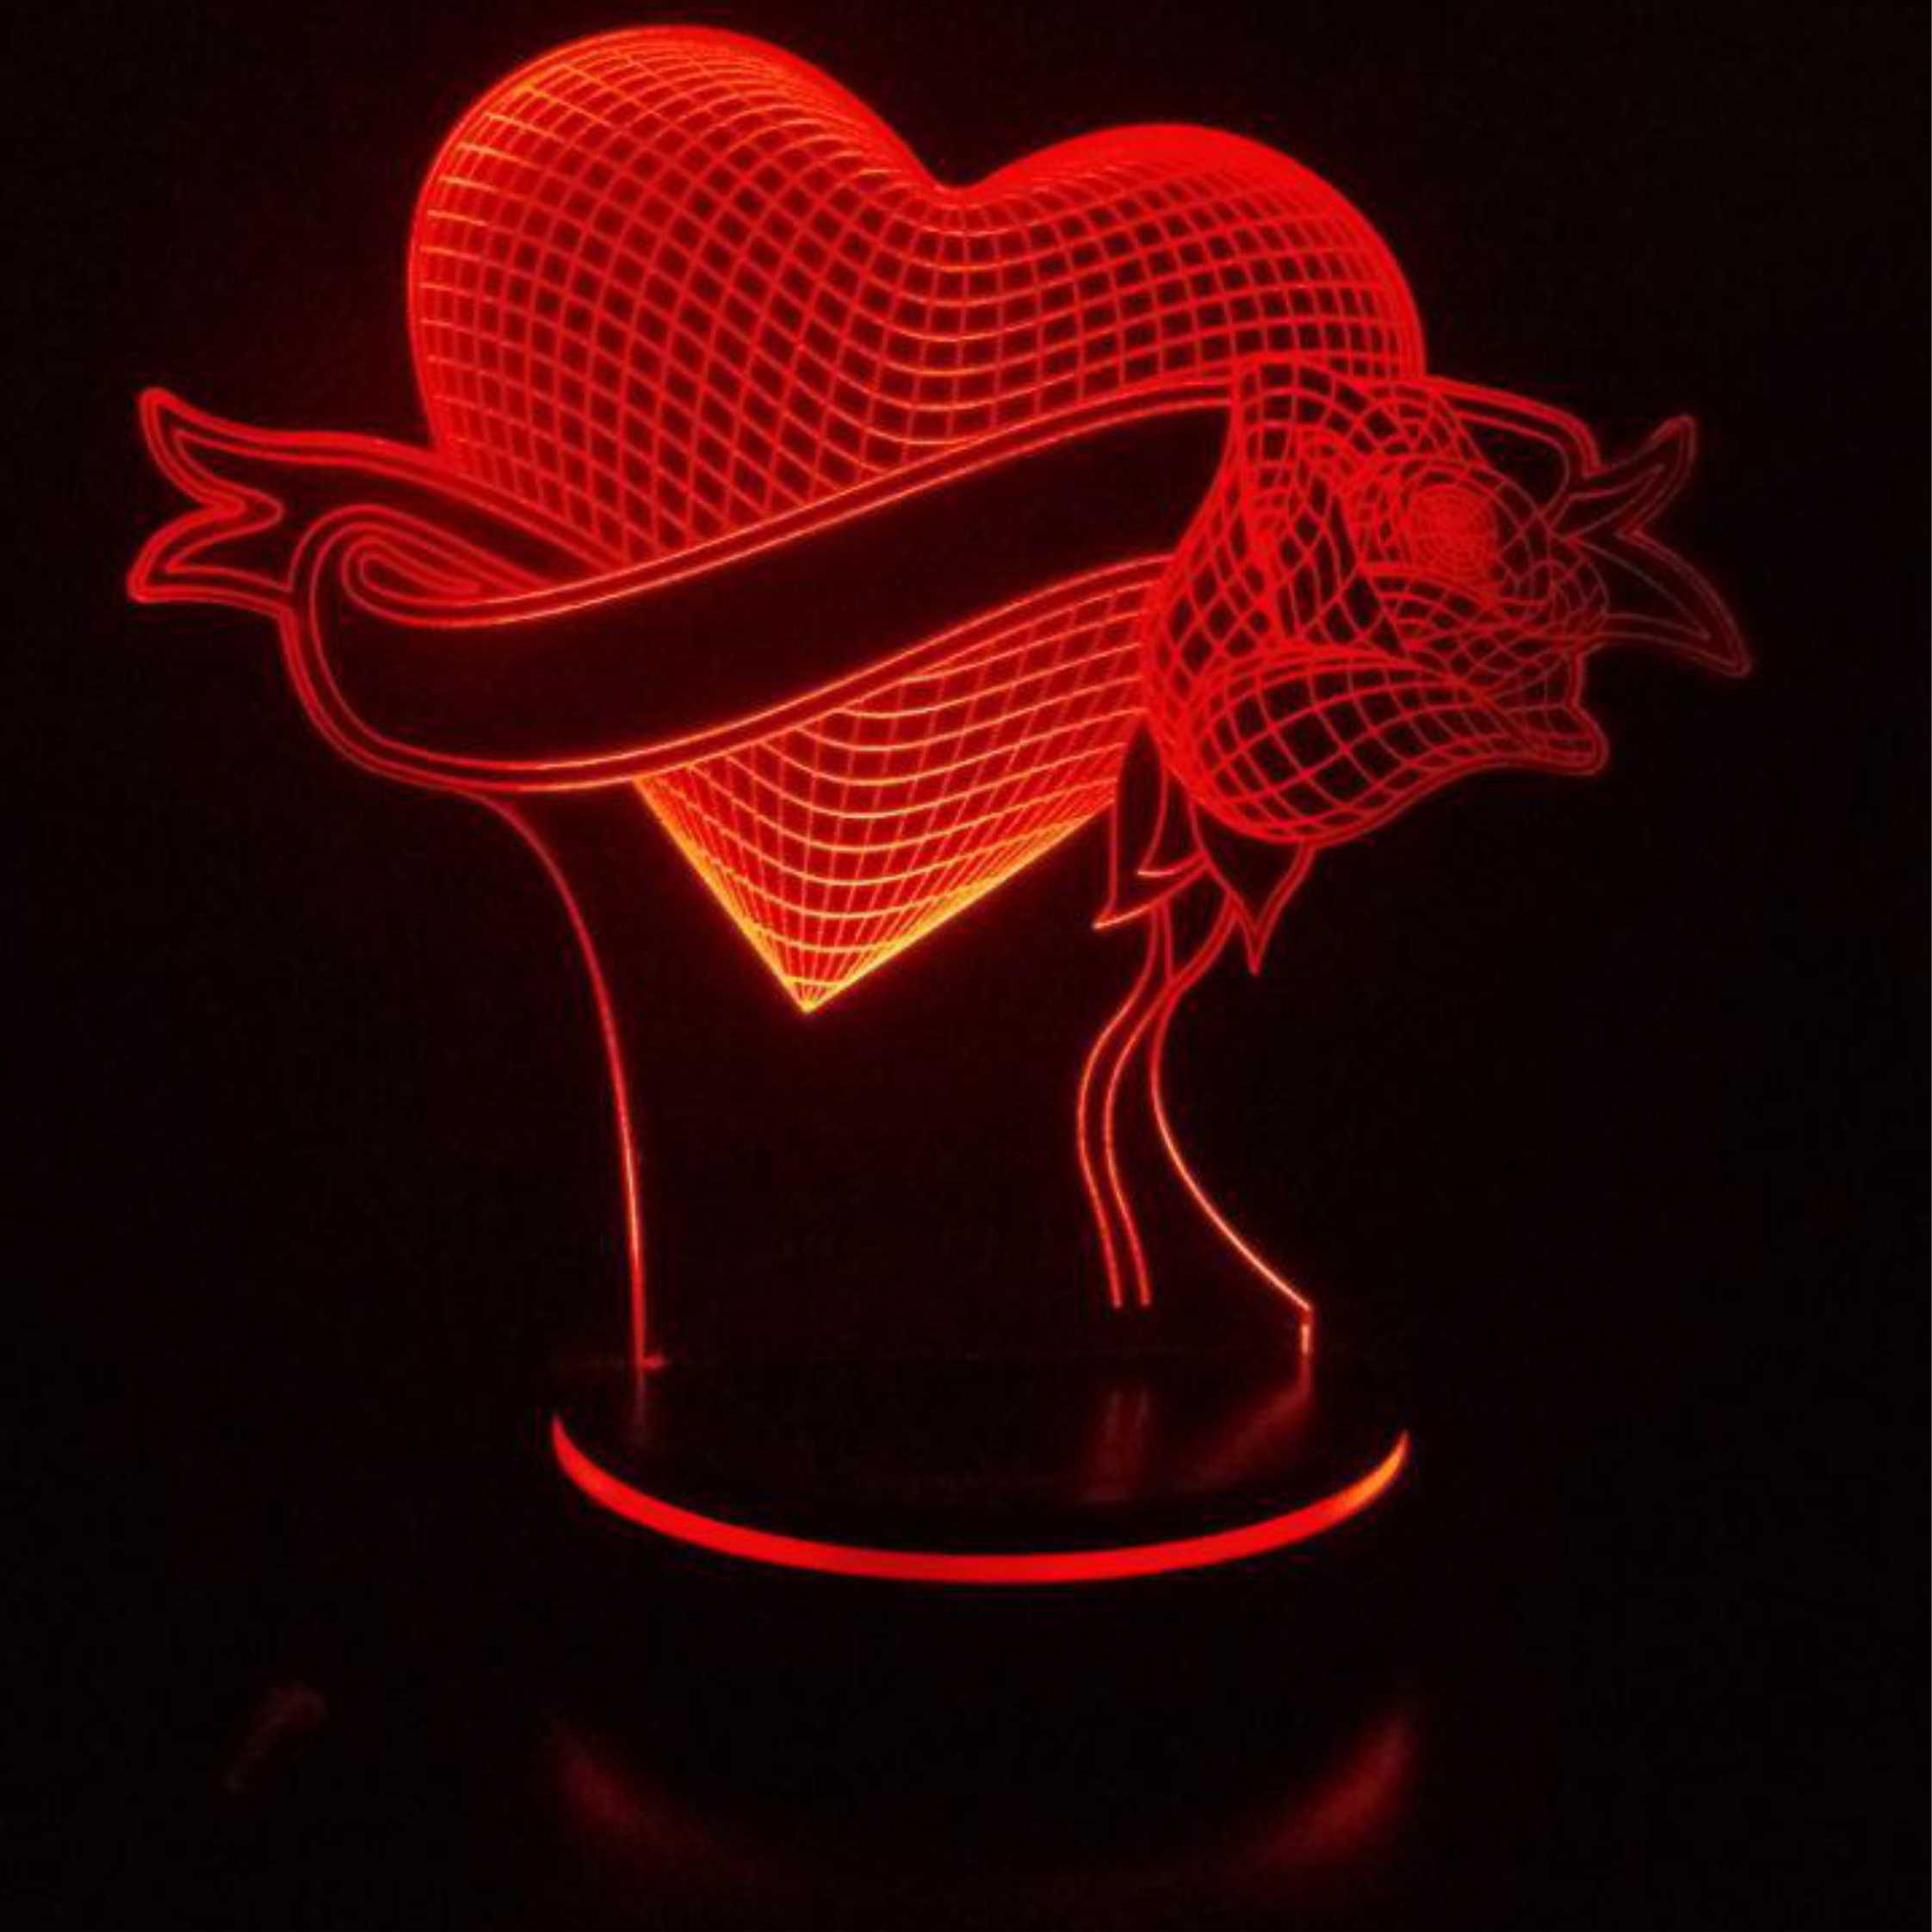 چراغ خواب سه بعدی پارسافن لیزر طرح عاشقانه قلب و گل